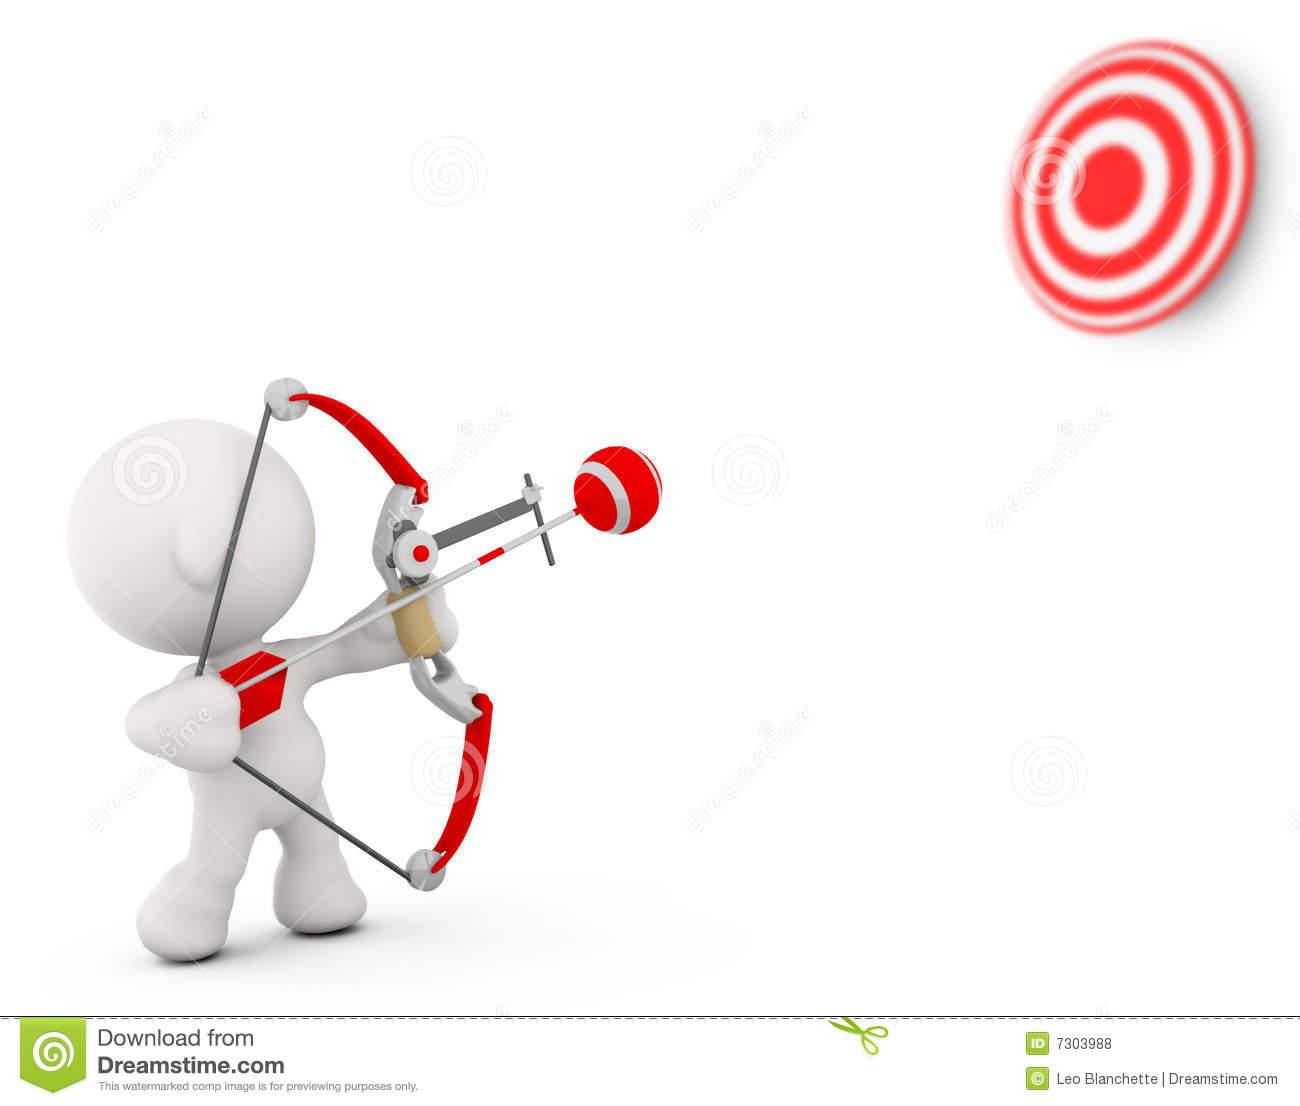 Shooting arrow target clipart image transparent download Shooting arrow target clipart - ClipartFest image transparent download